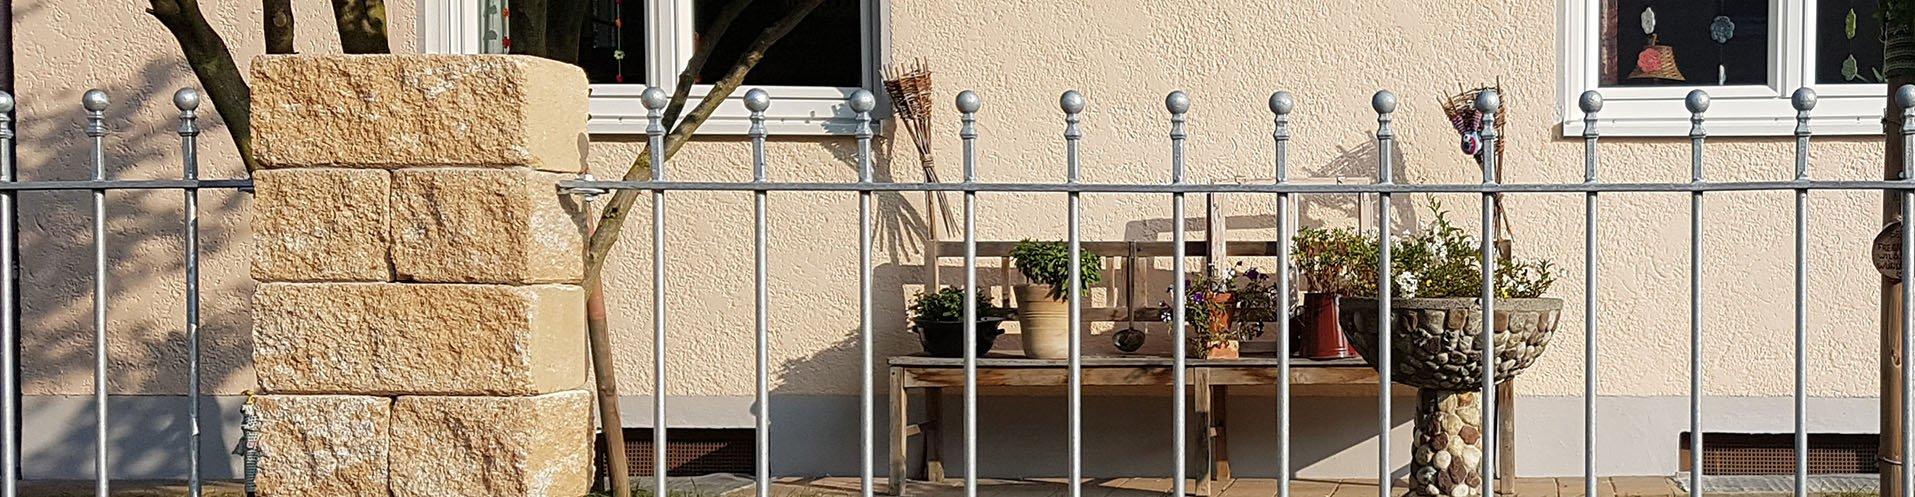 zaunelemente aus metall verzinkt eleo. Black Bedroom Furniture Sets. Home Design Ideas